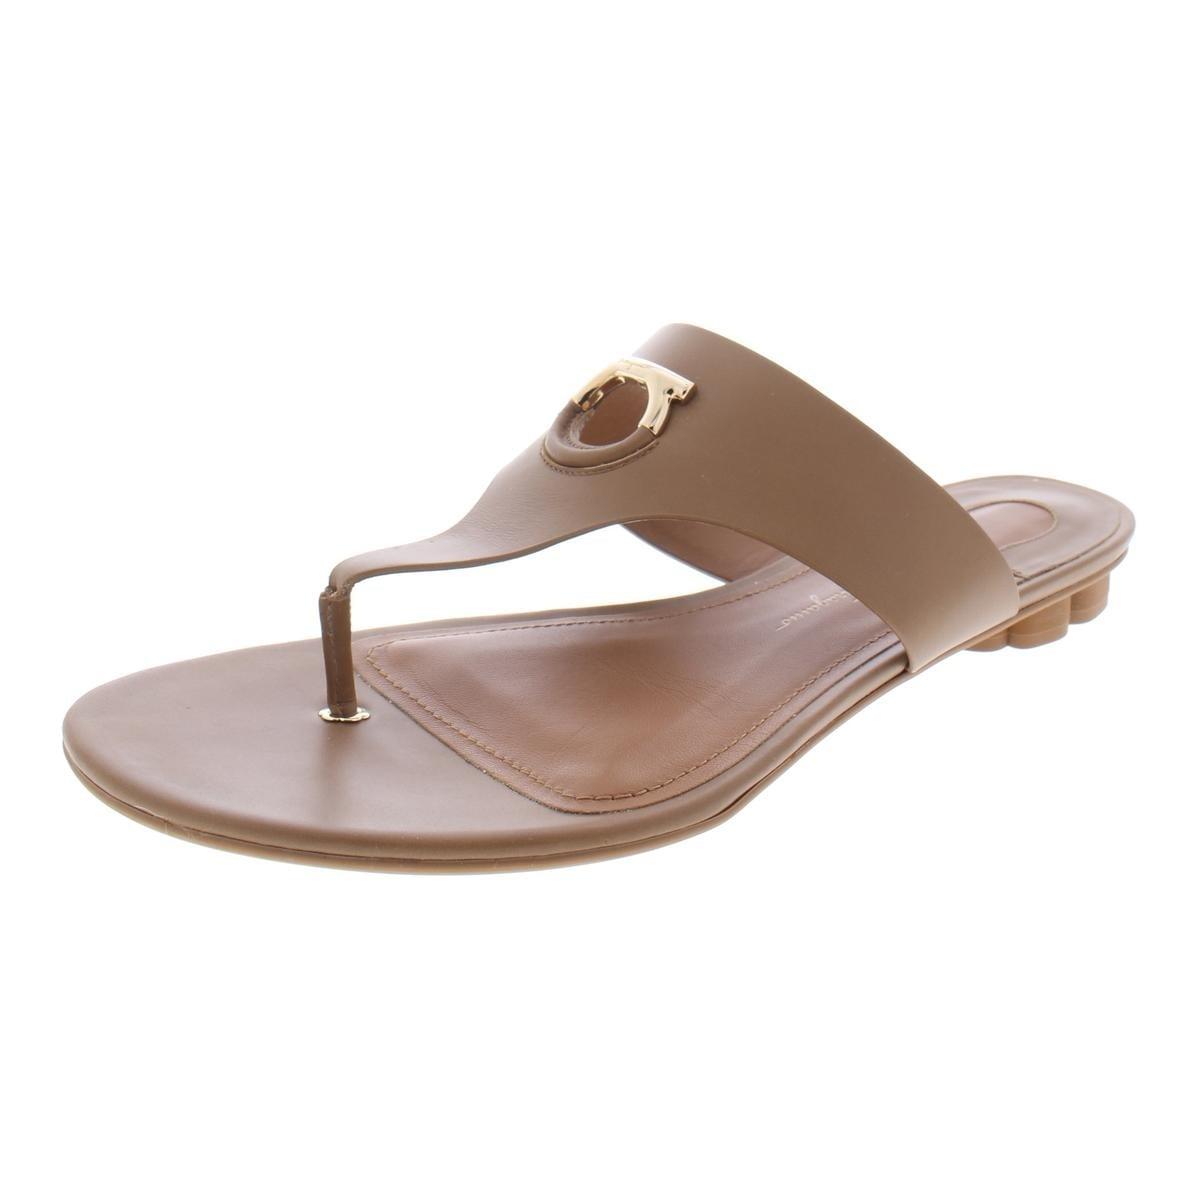 0aa7ebd2166 Salvatore ferragamo womens enfola thong sandal thong sandals metal trim jpg  1200x1200 Ferragamo womens pool sandals